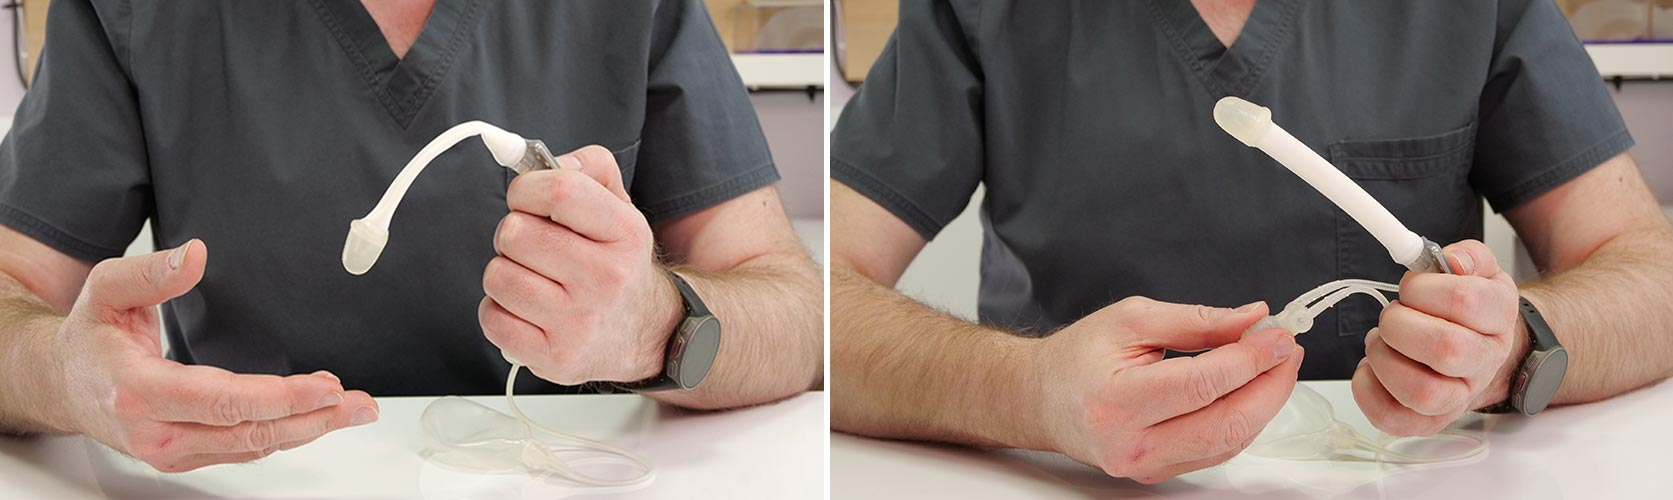 Implant prącia - wzwód